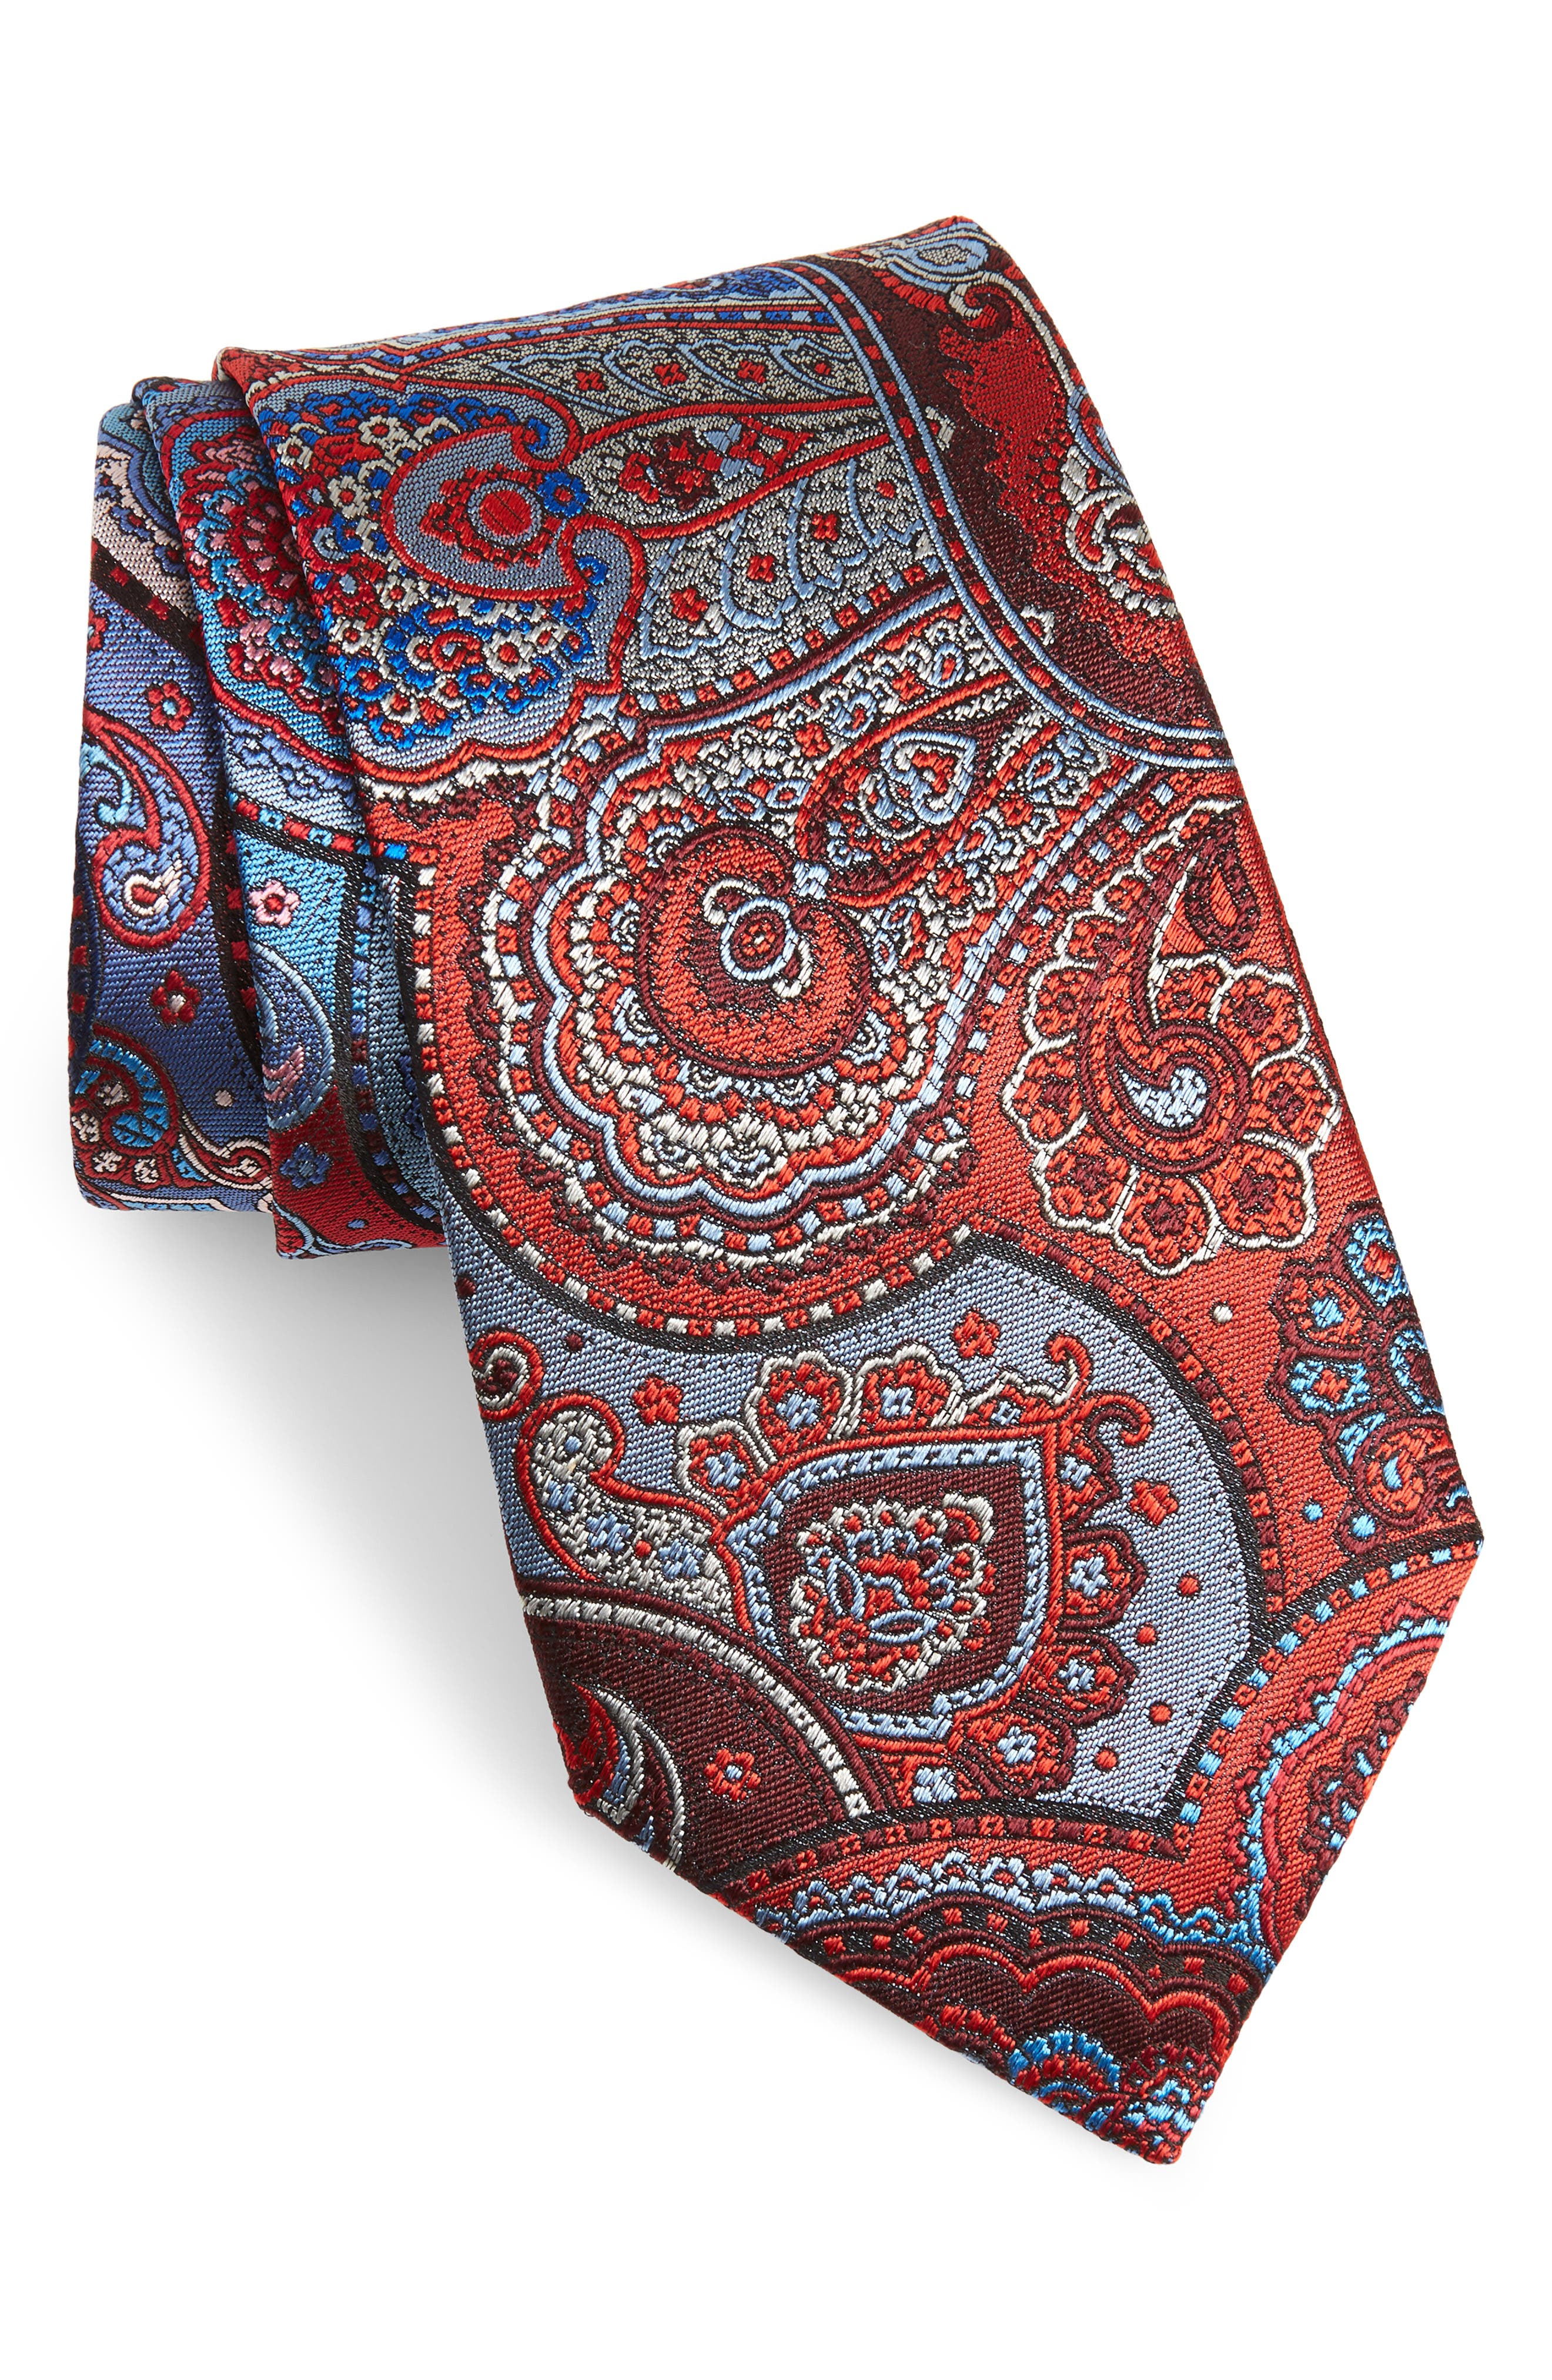 ERMENEGILDO ZEGNA, Quindici Paisley Silk Tie, Main thumbnail 1, color, RED